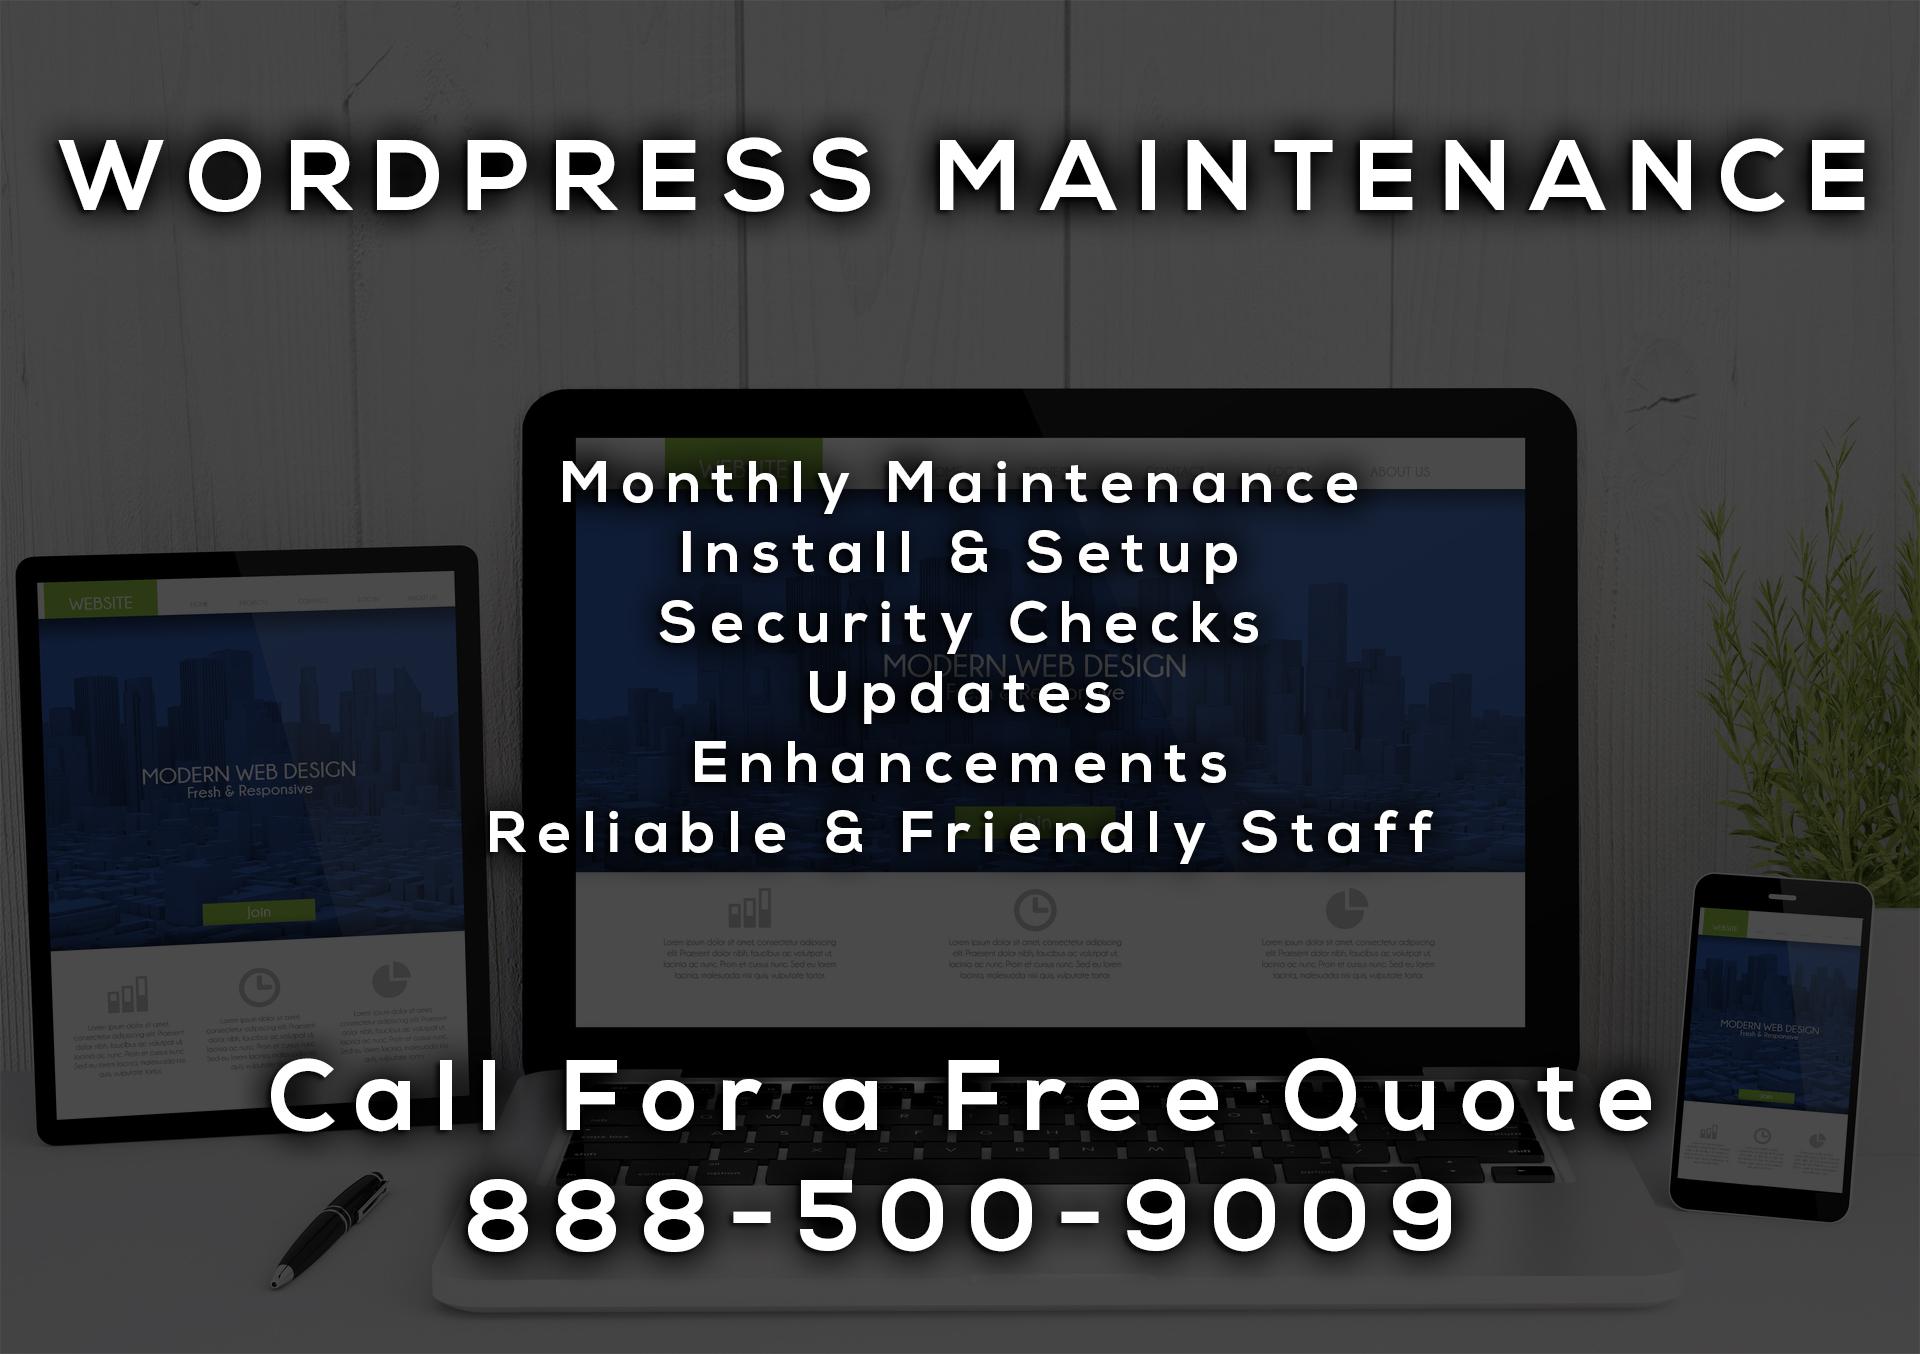 WordPress Maintenance Services West Covina CA